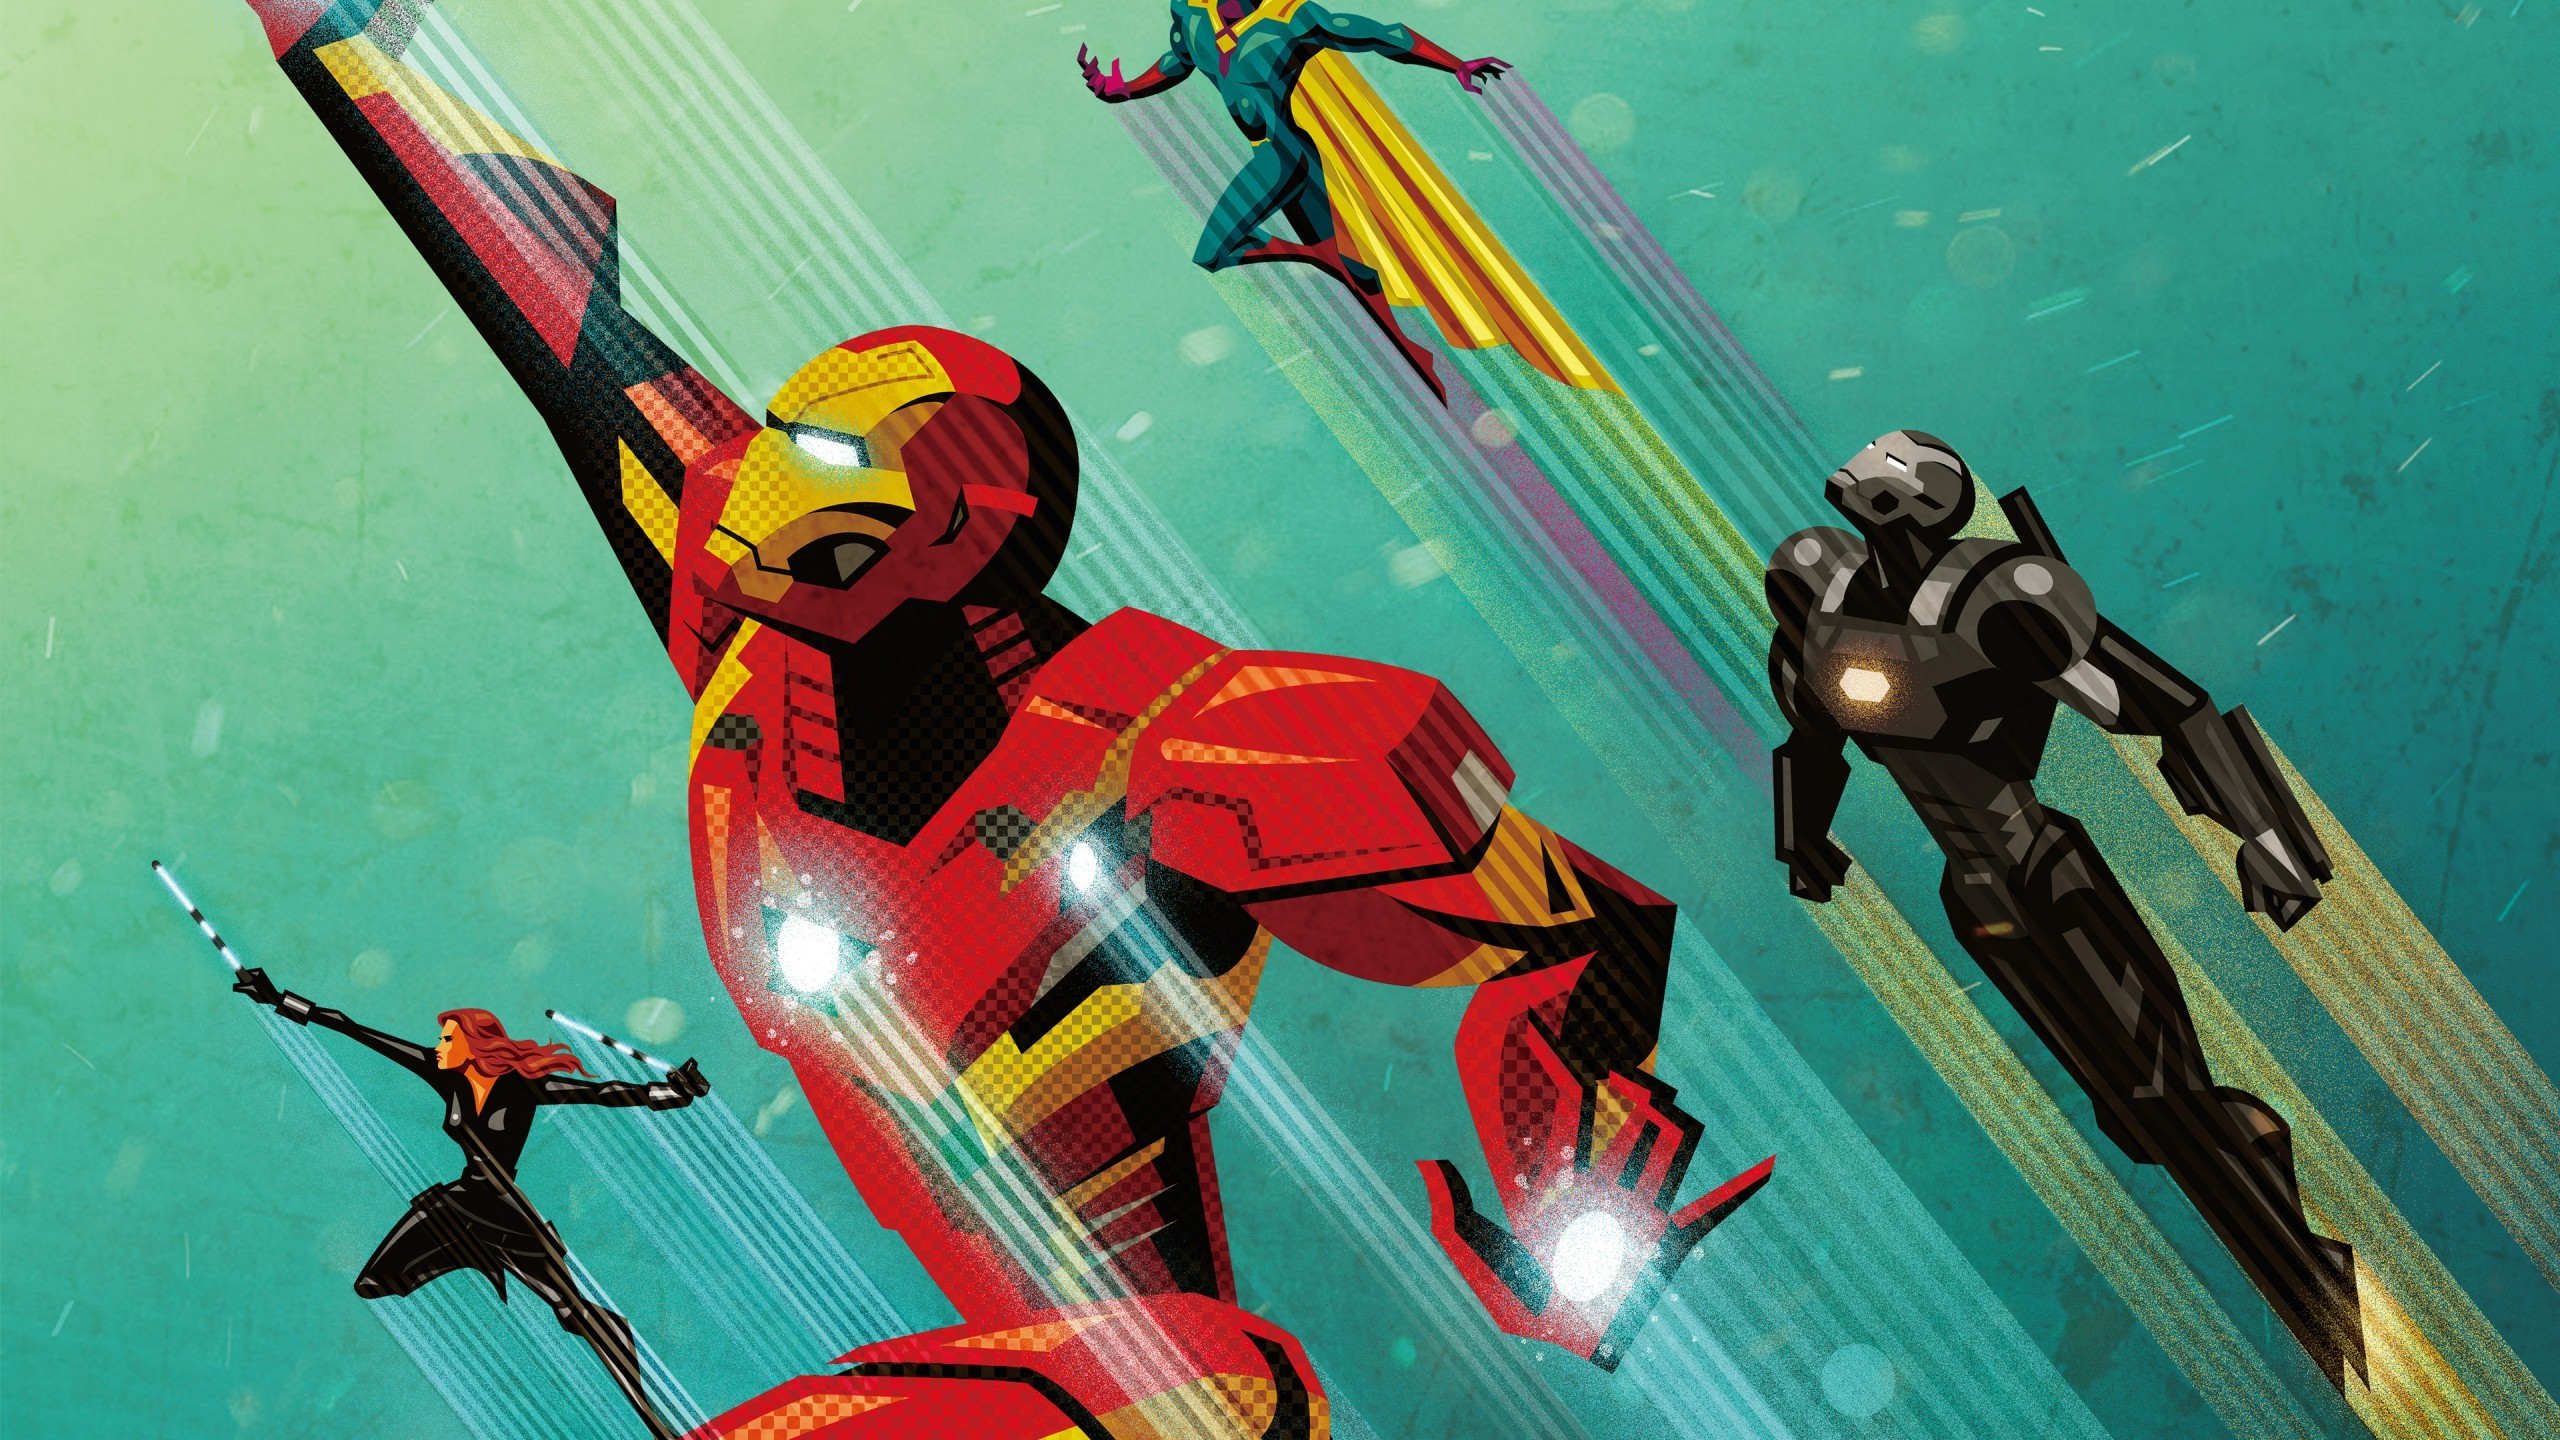 4K Superhero Wallpapers (52+ Images